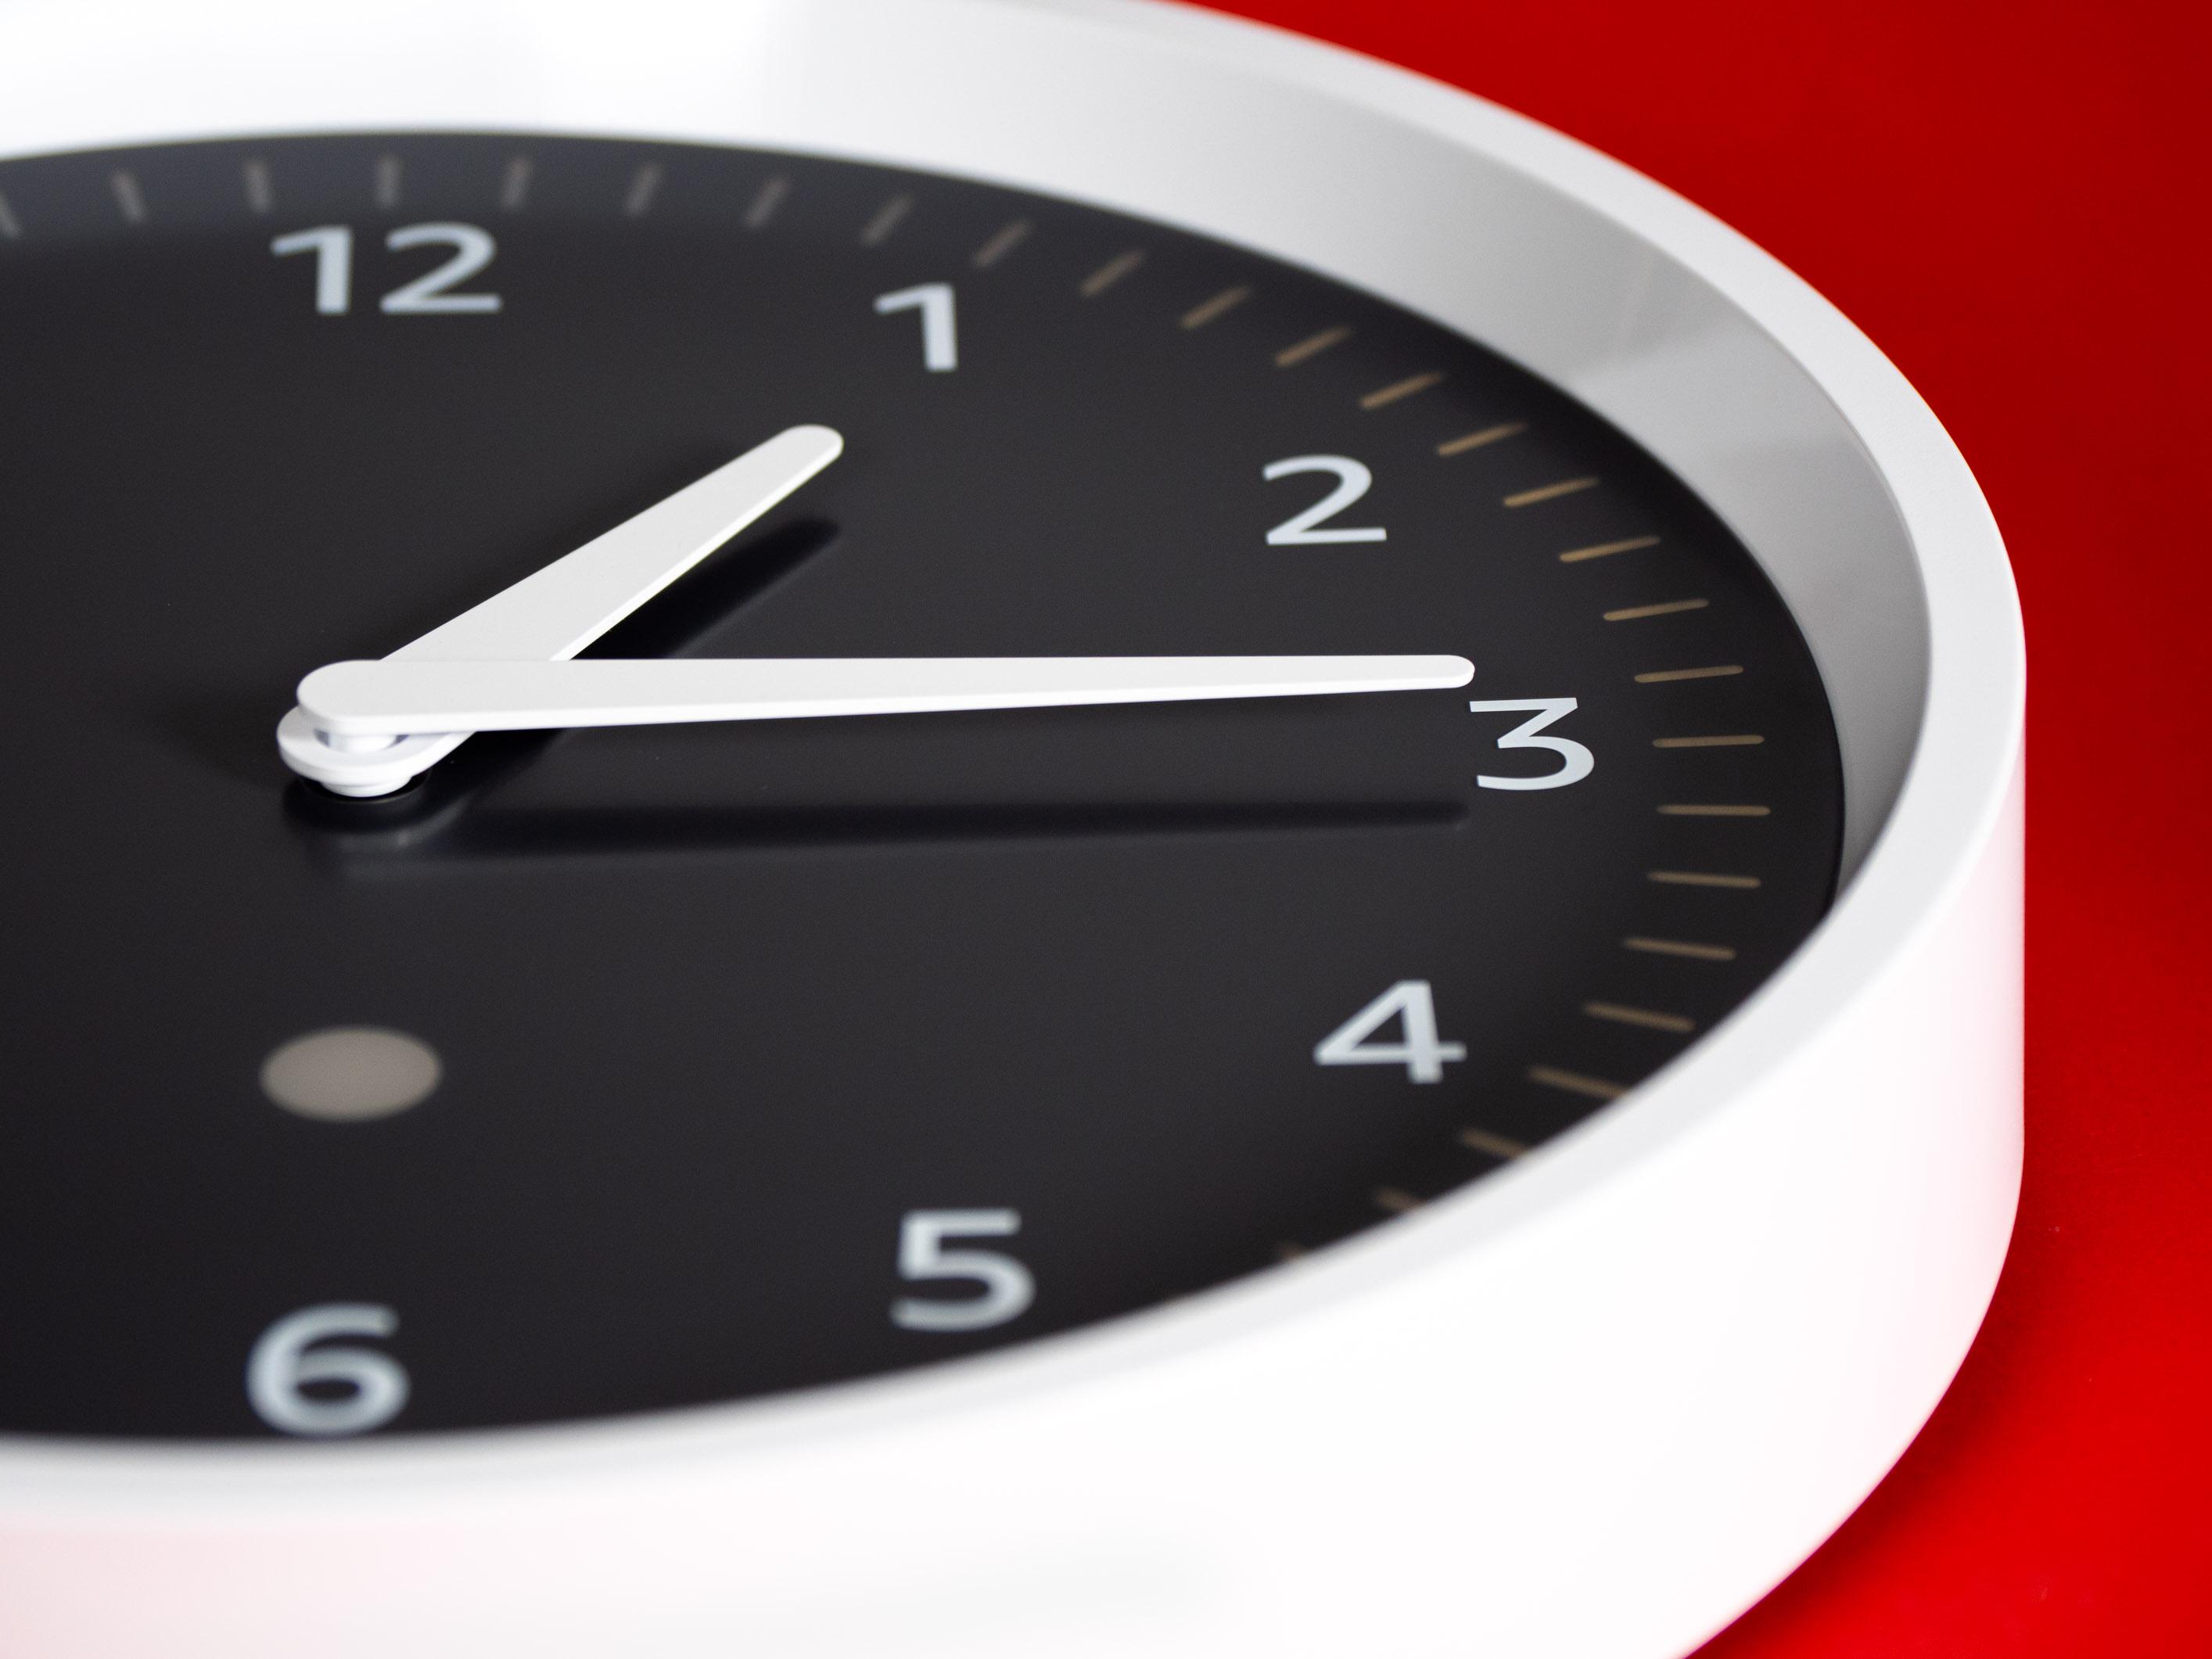 Echo Wall Clock im Test: Ach du liebe Zeit, Amazon! - Amazons Echo Wall Clock (Bild: Martin Wolf/Golem.de)